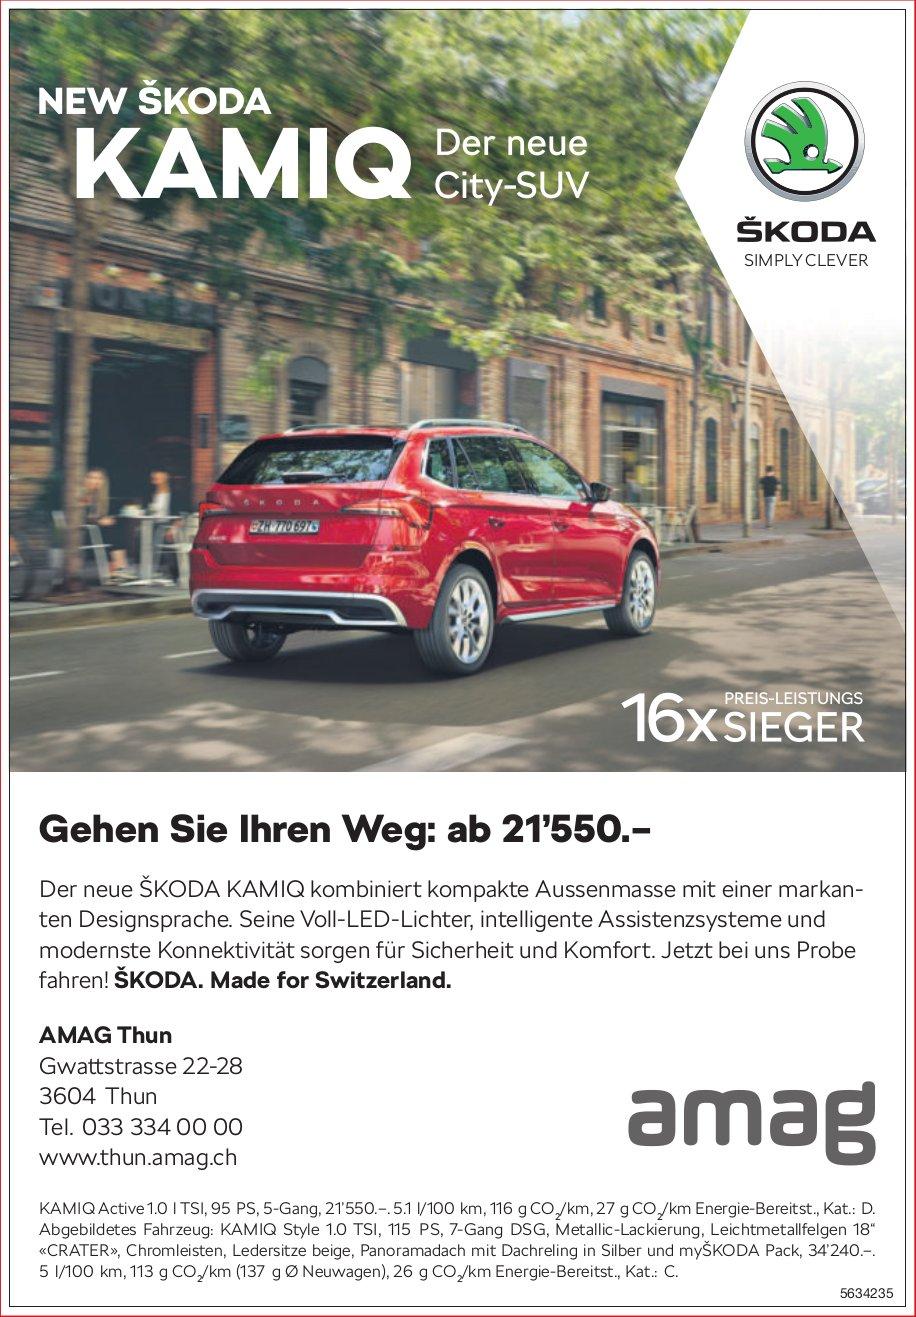 AMAG Thun - NEW SKODA KAMIQ: Der neue City-SUV